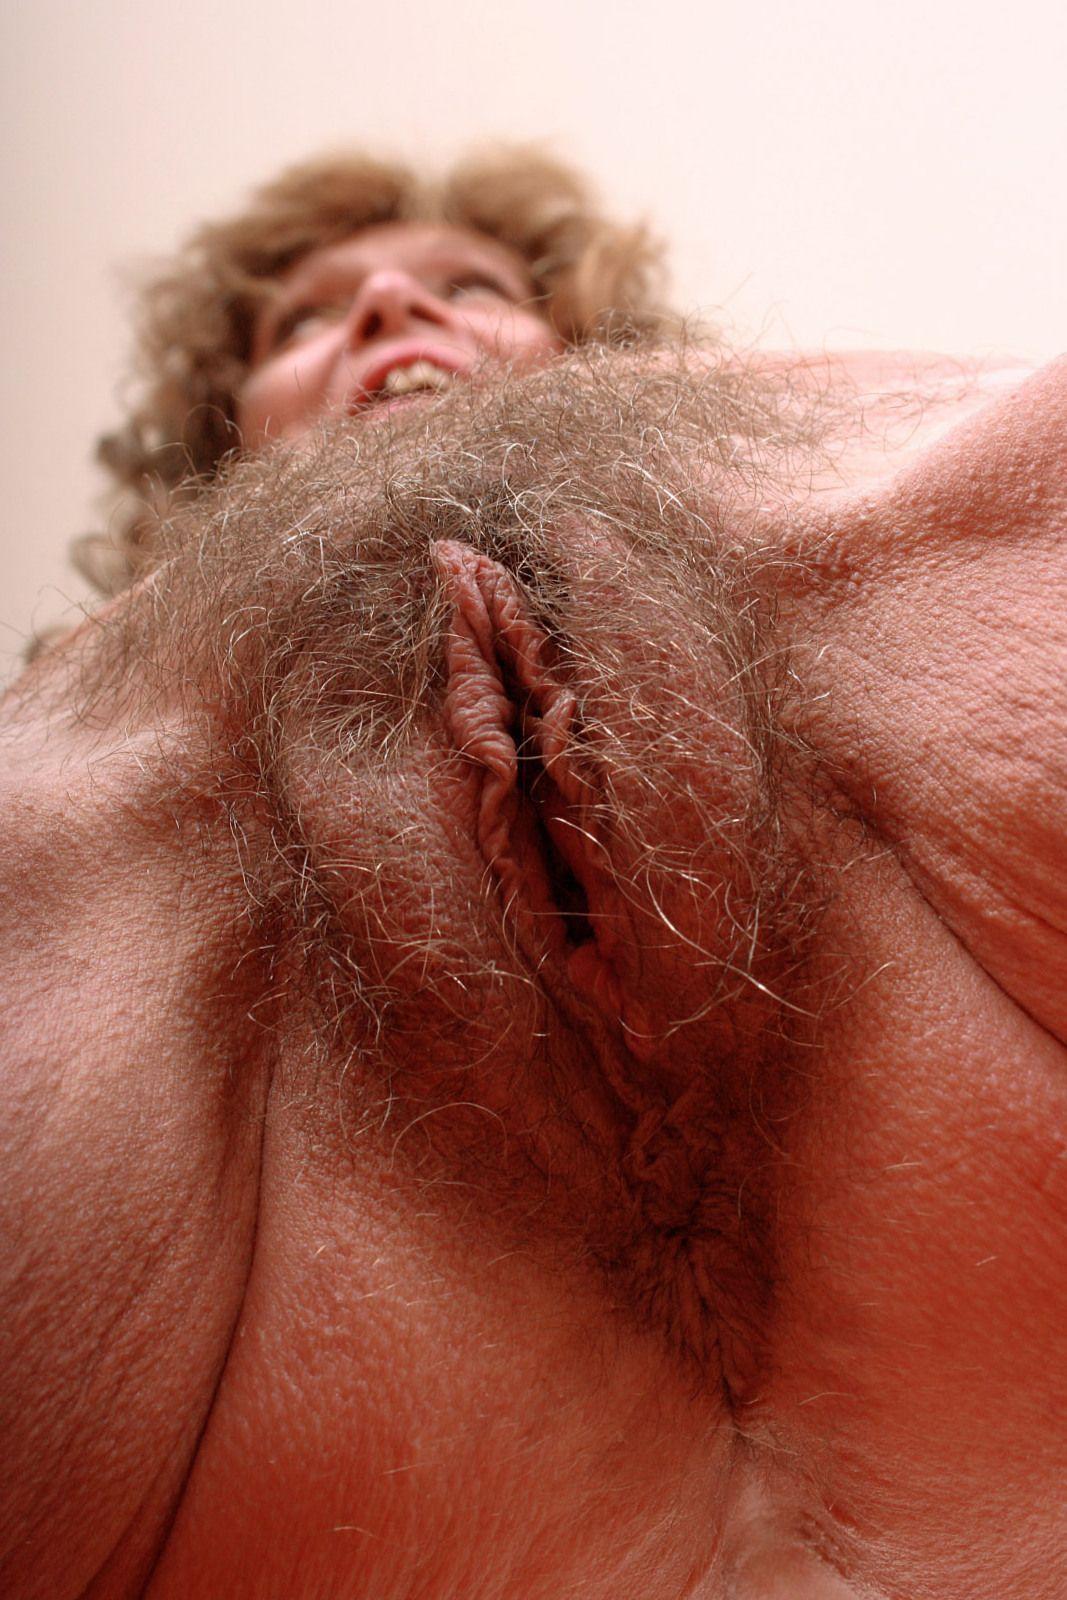 baise vieille femme grosse foufoune